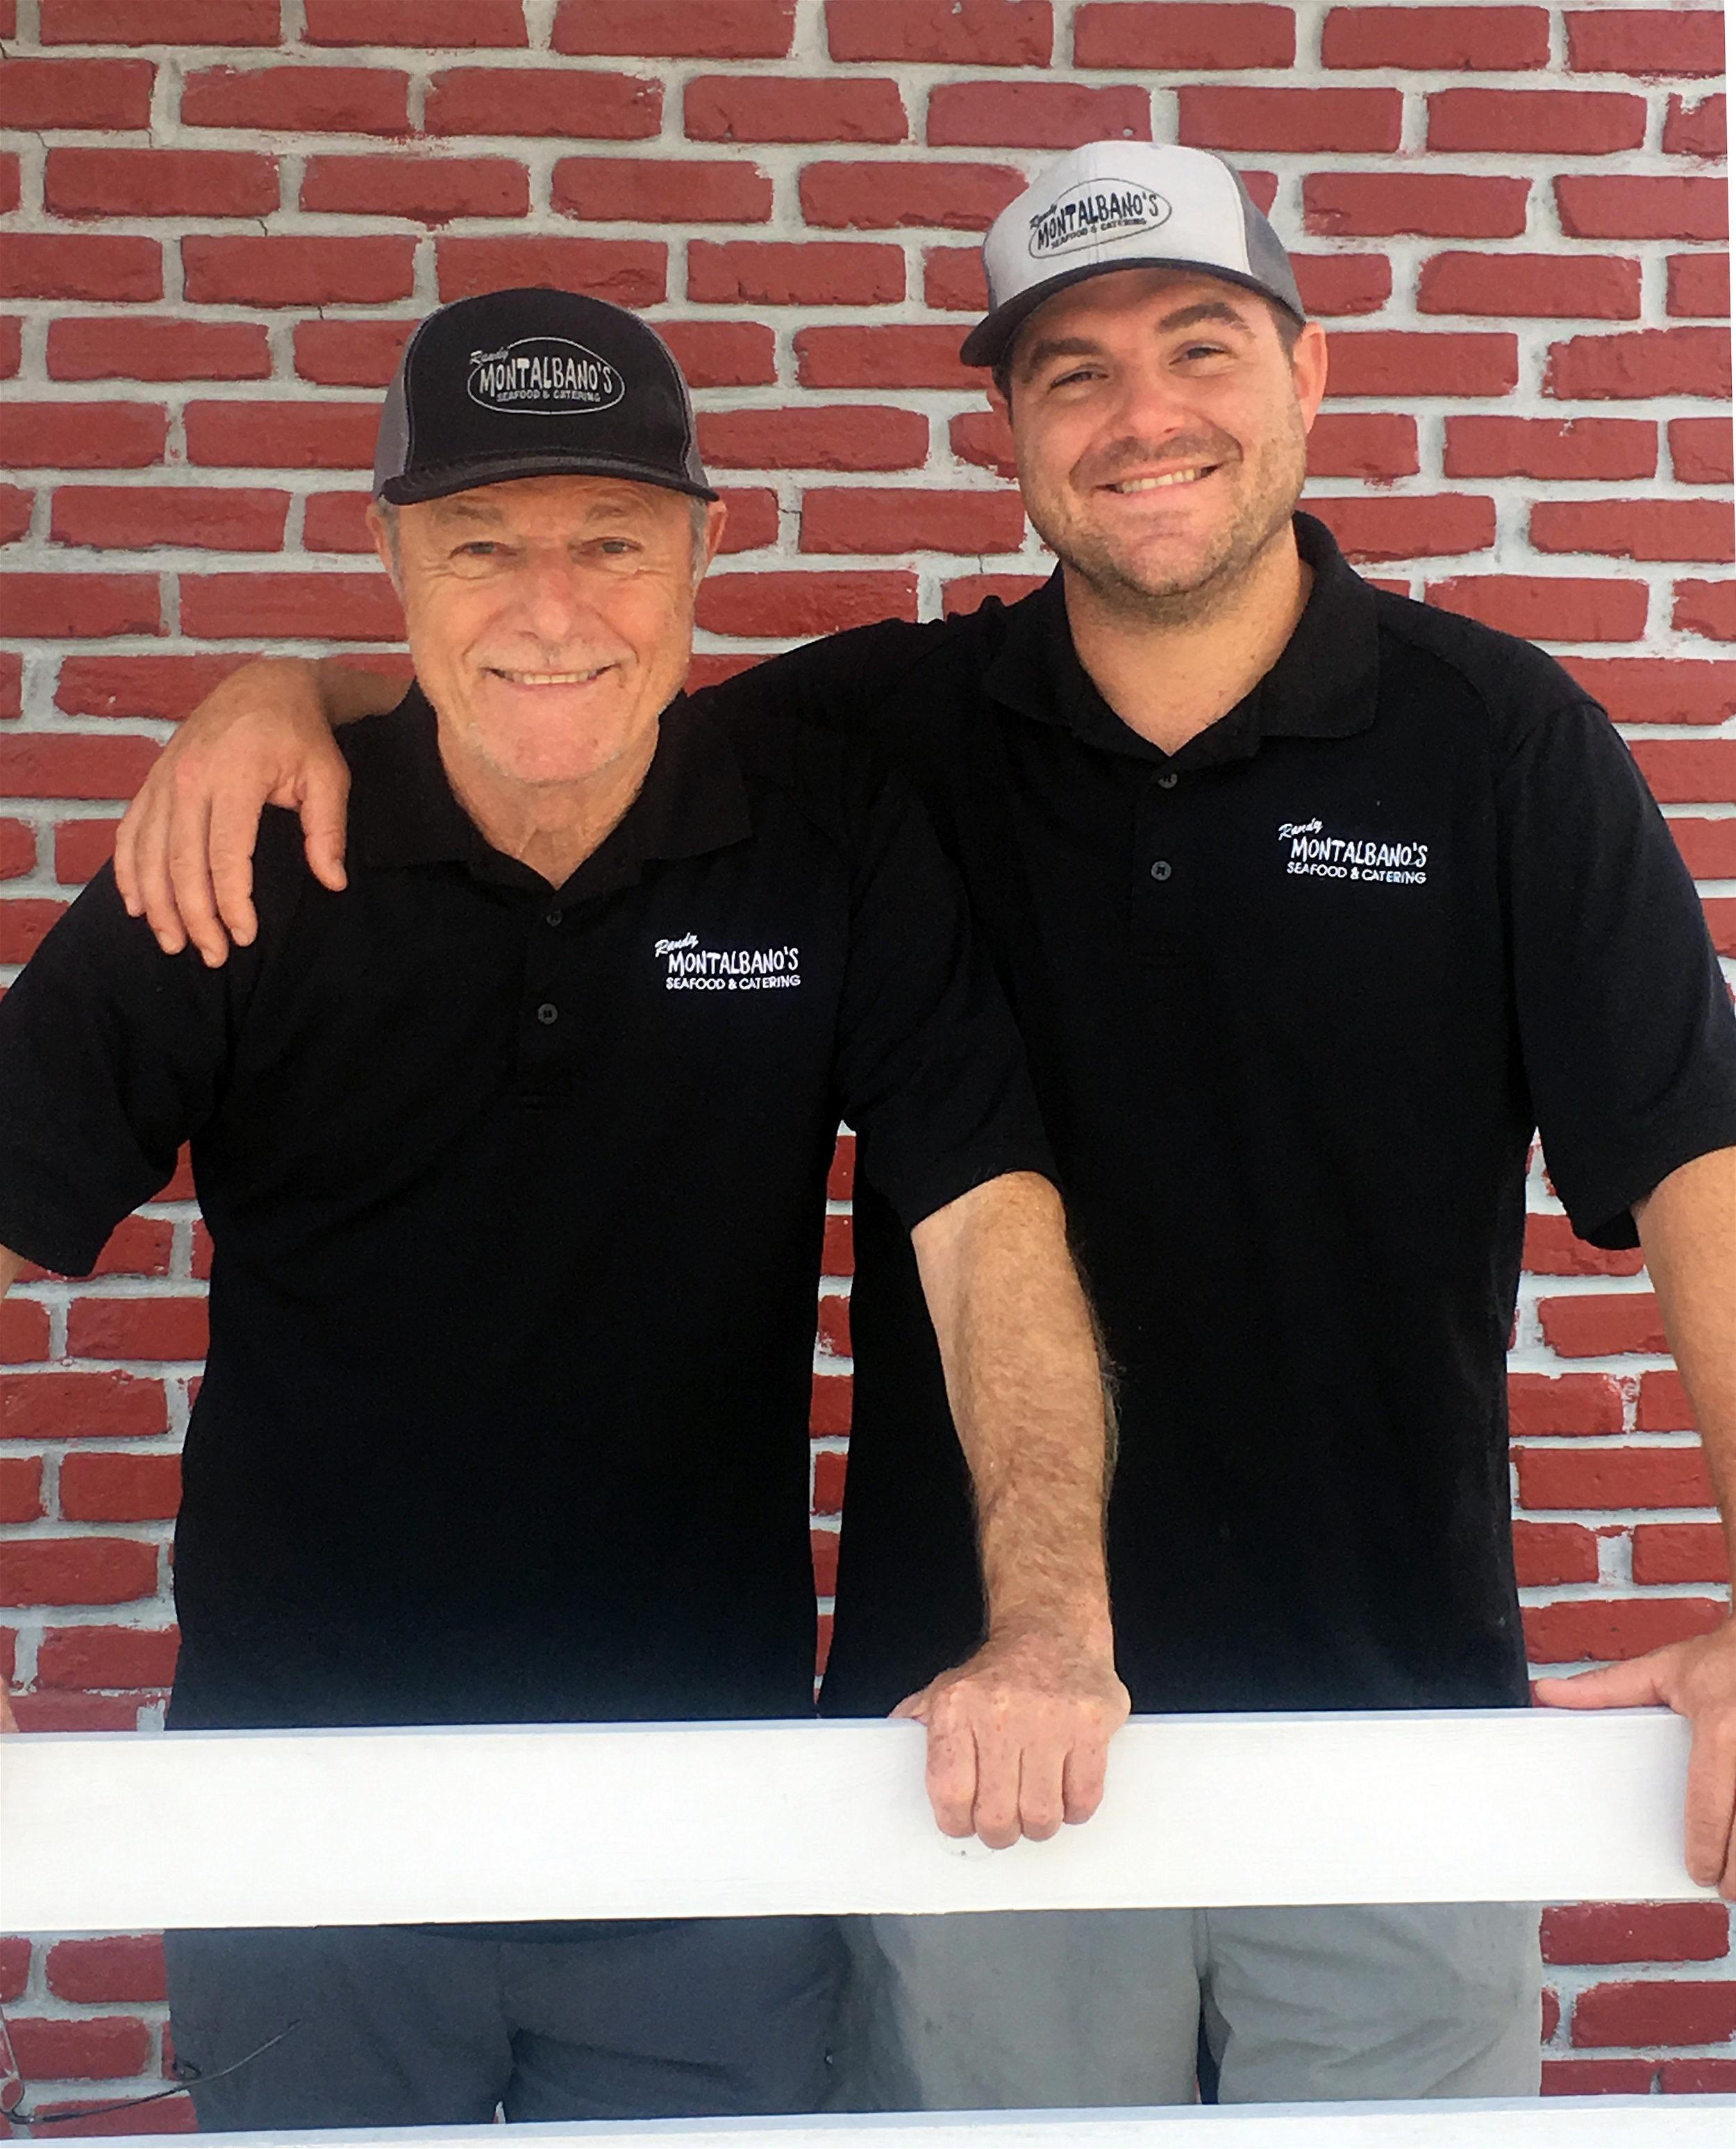 Randy Montalbano Sr. and Randy Montalbano Jr.